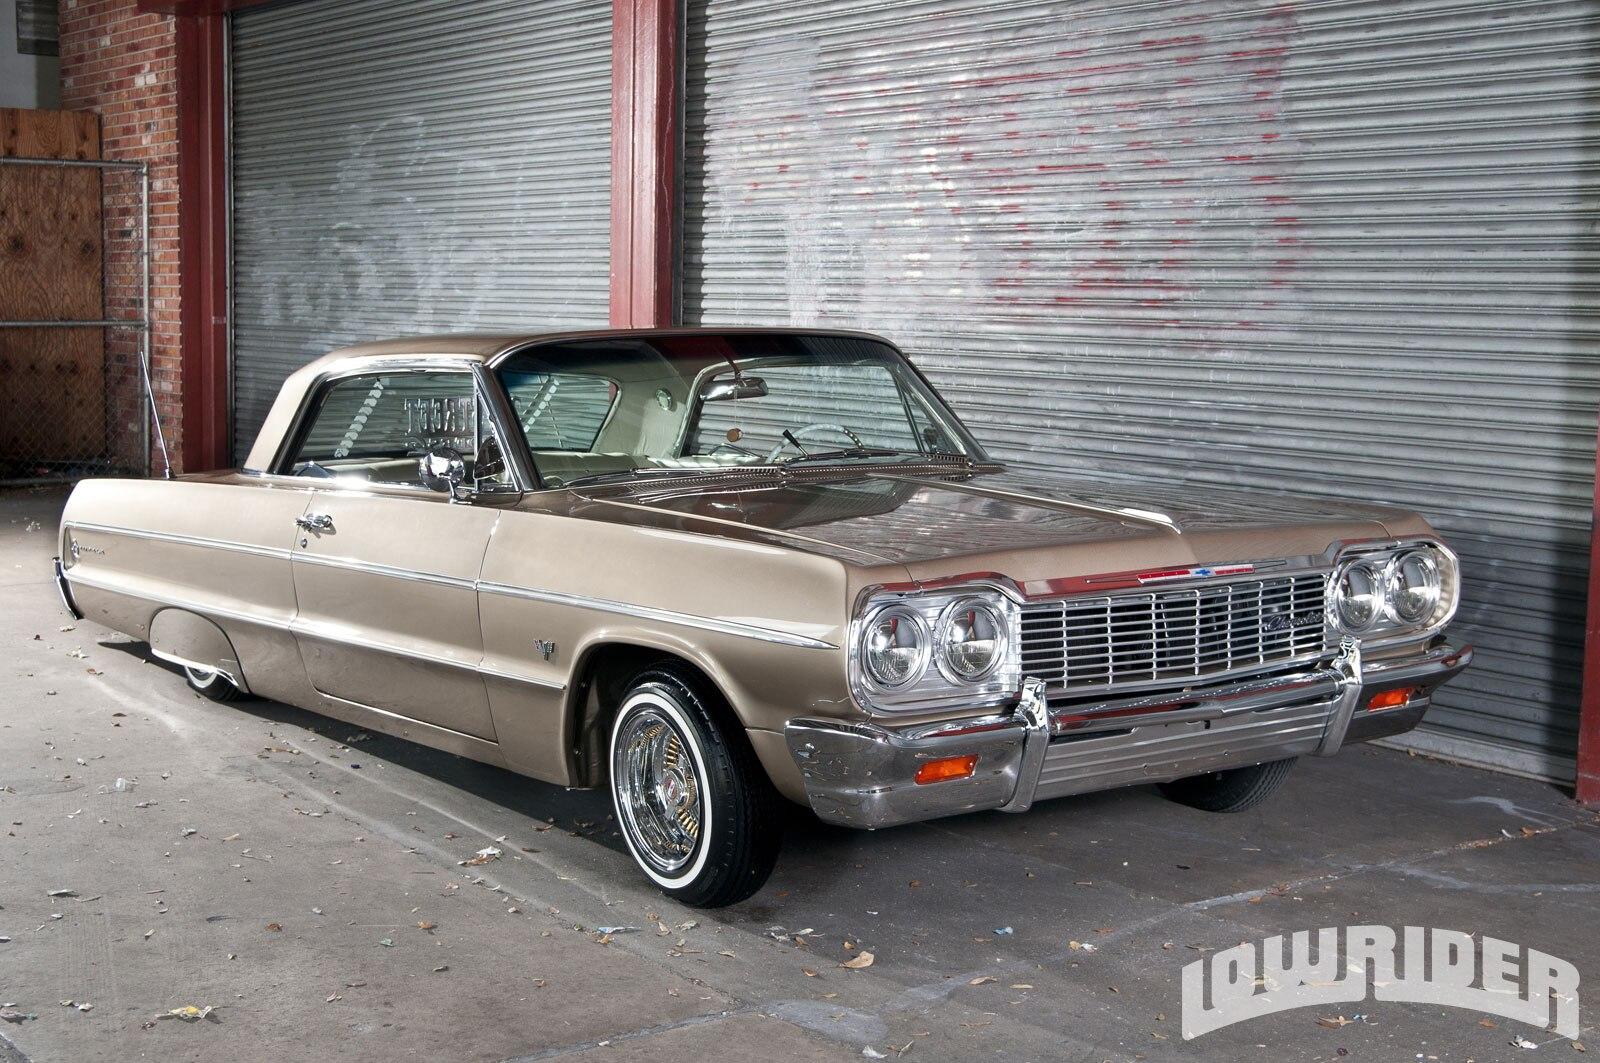 1209-lrmp-03-o-1964-chevrolet-impala-passenger-side-front-view2